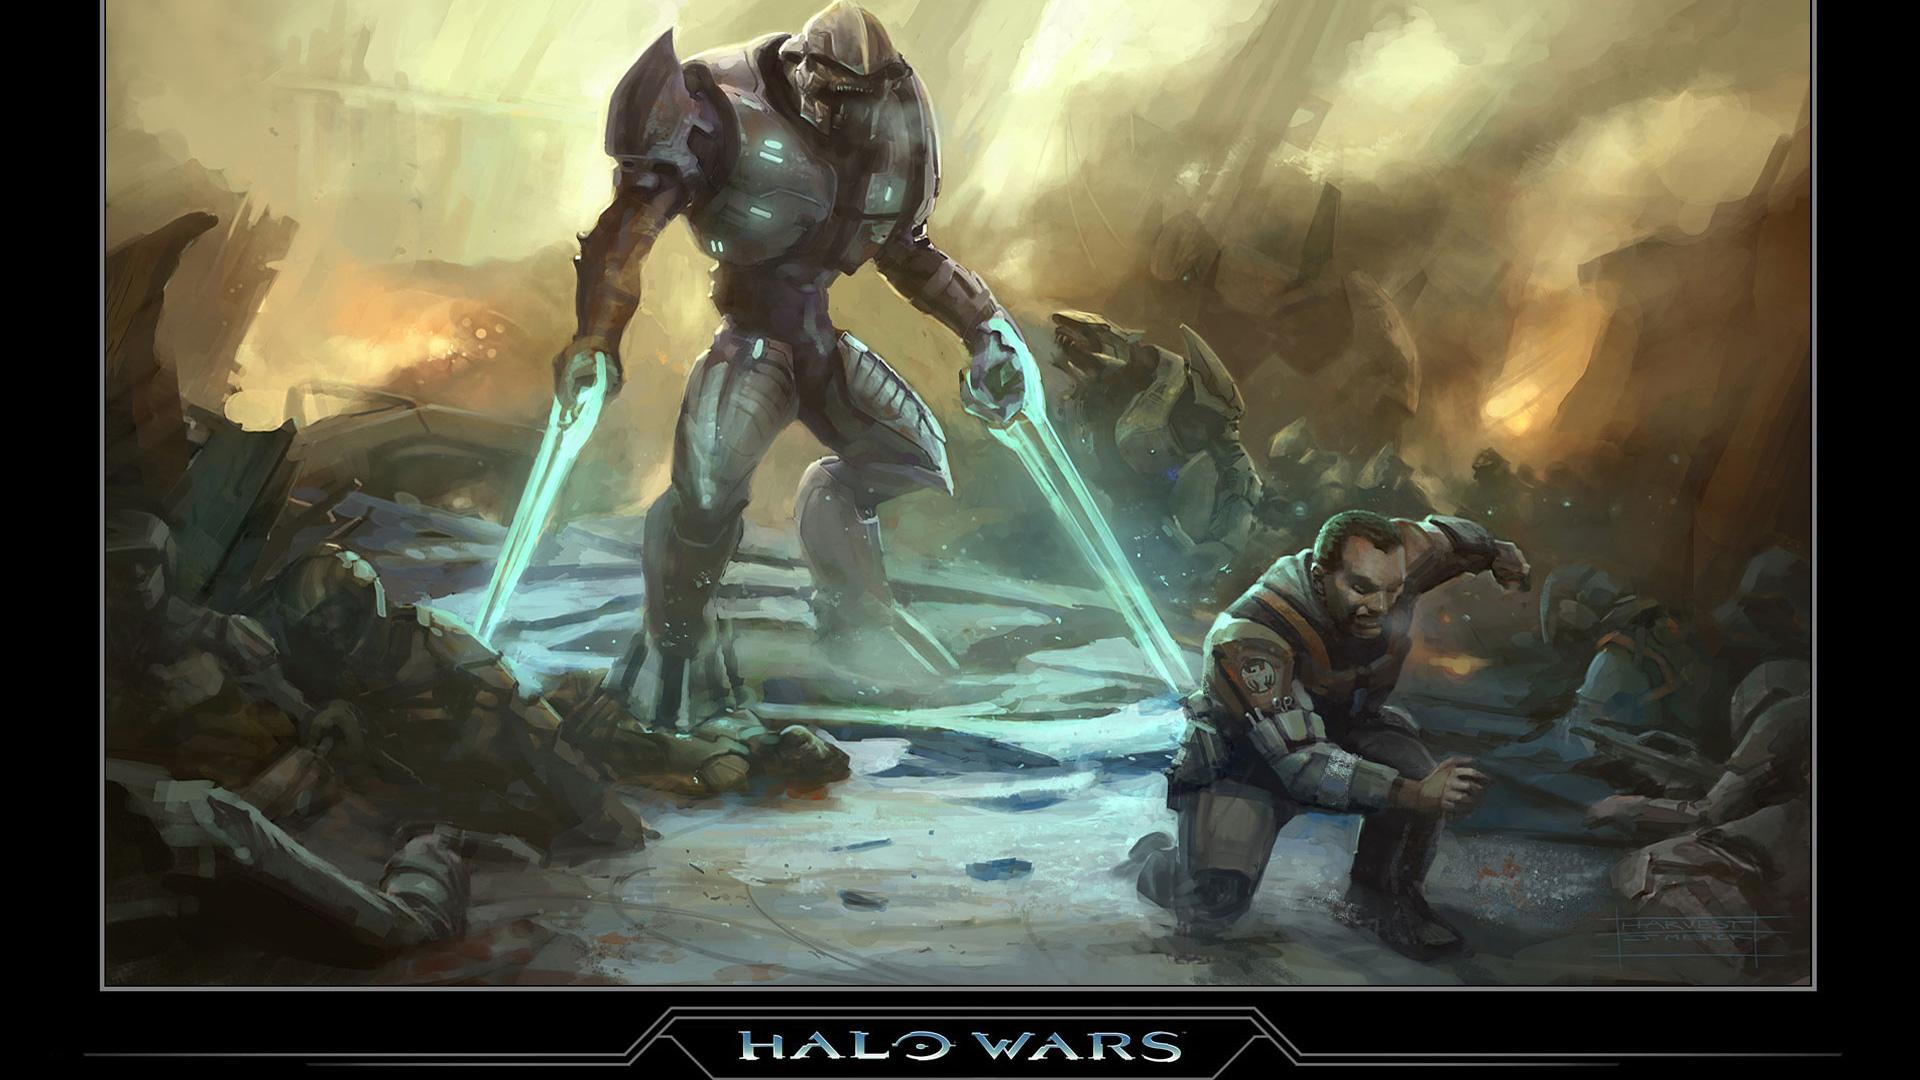 Free Halo Wars Wallpaper in 1920x1080